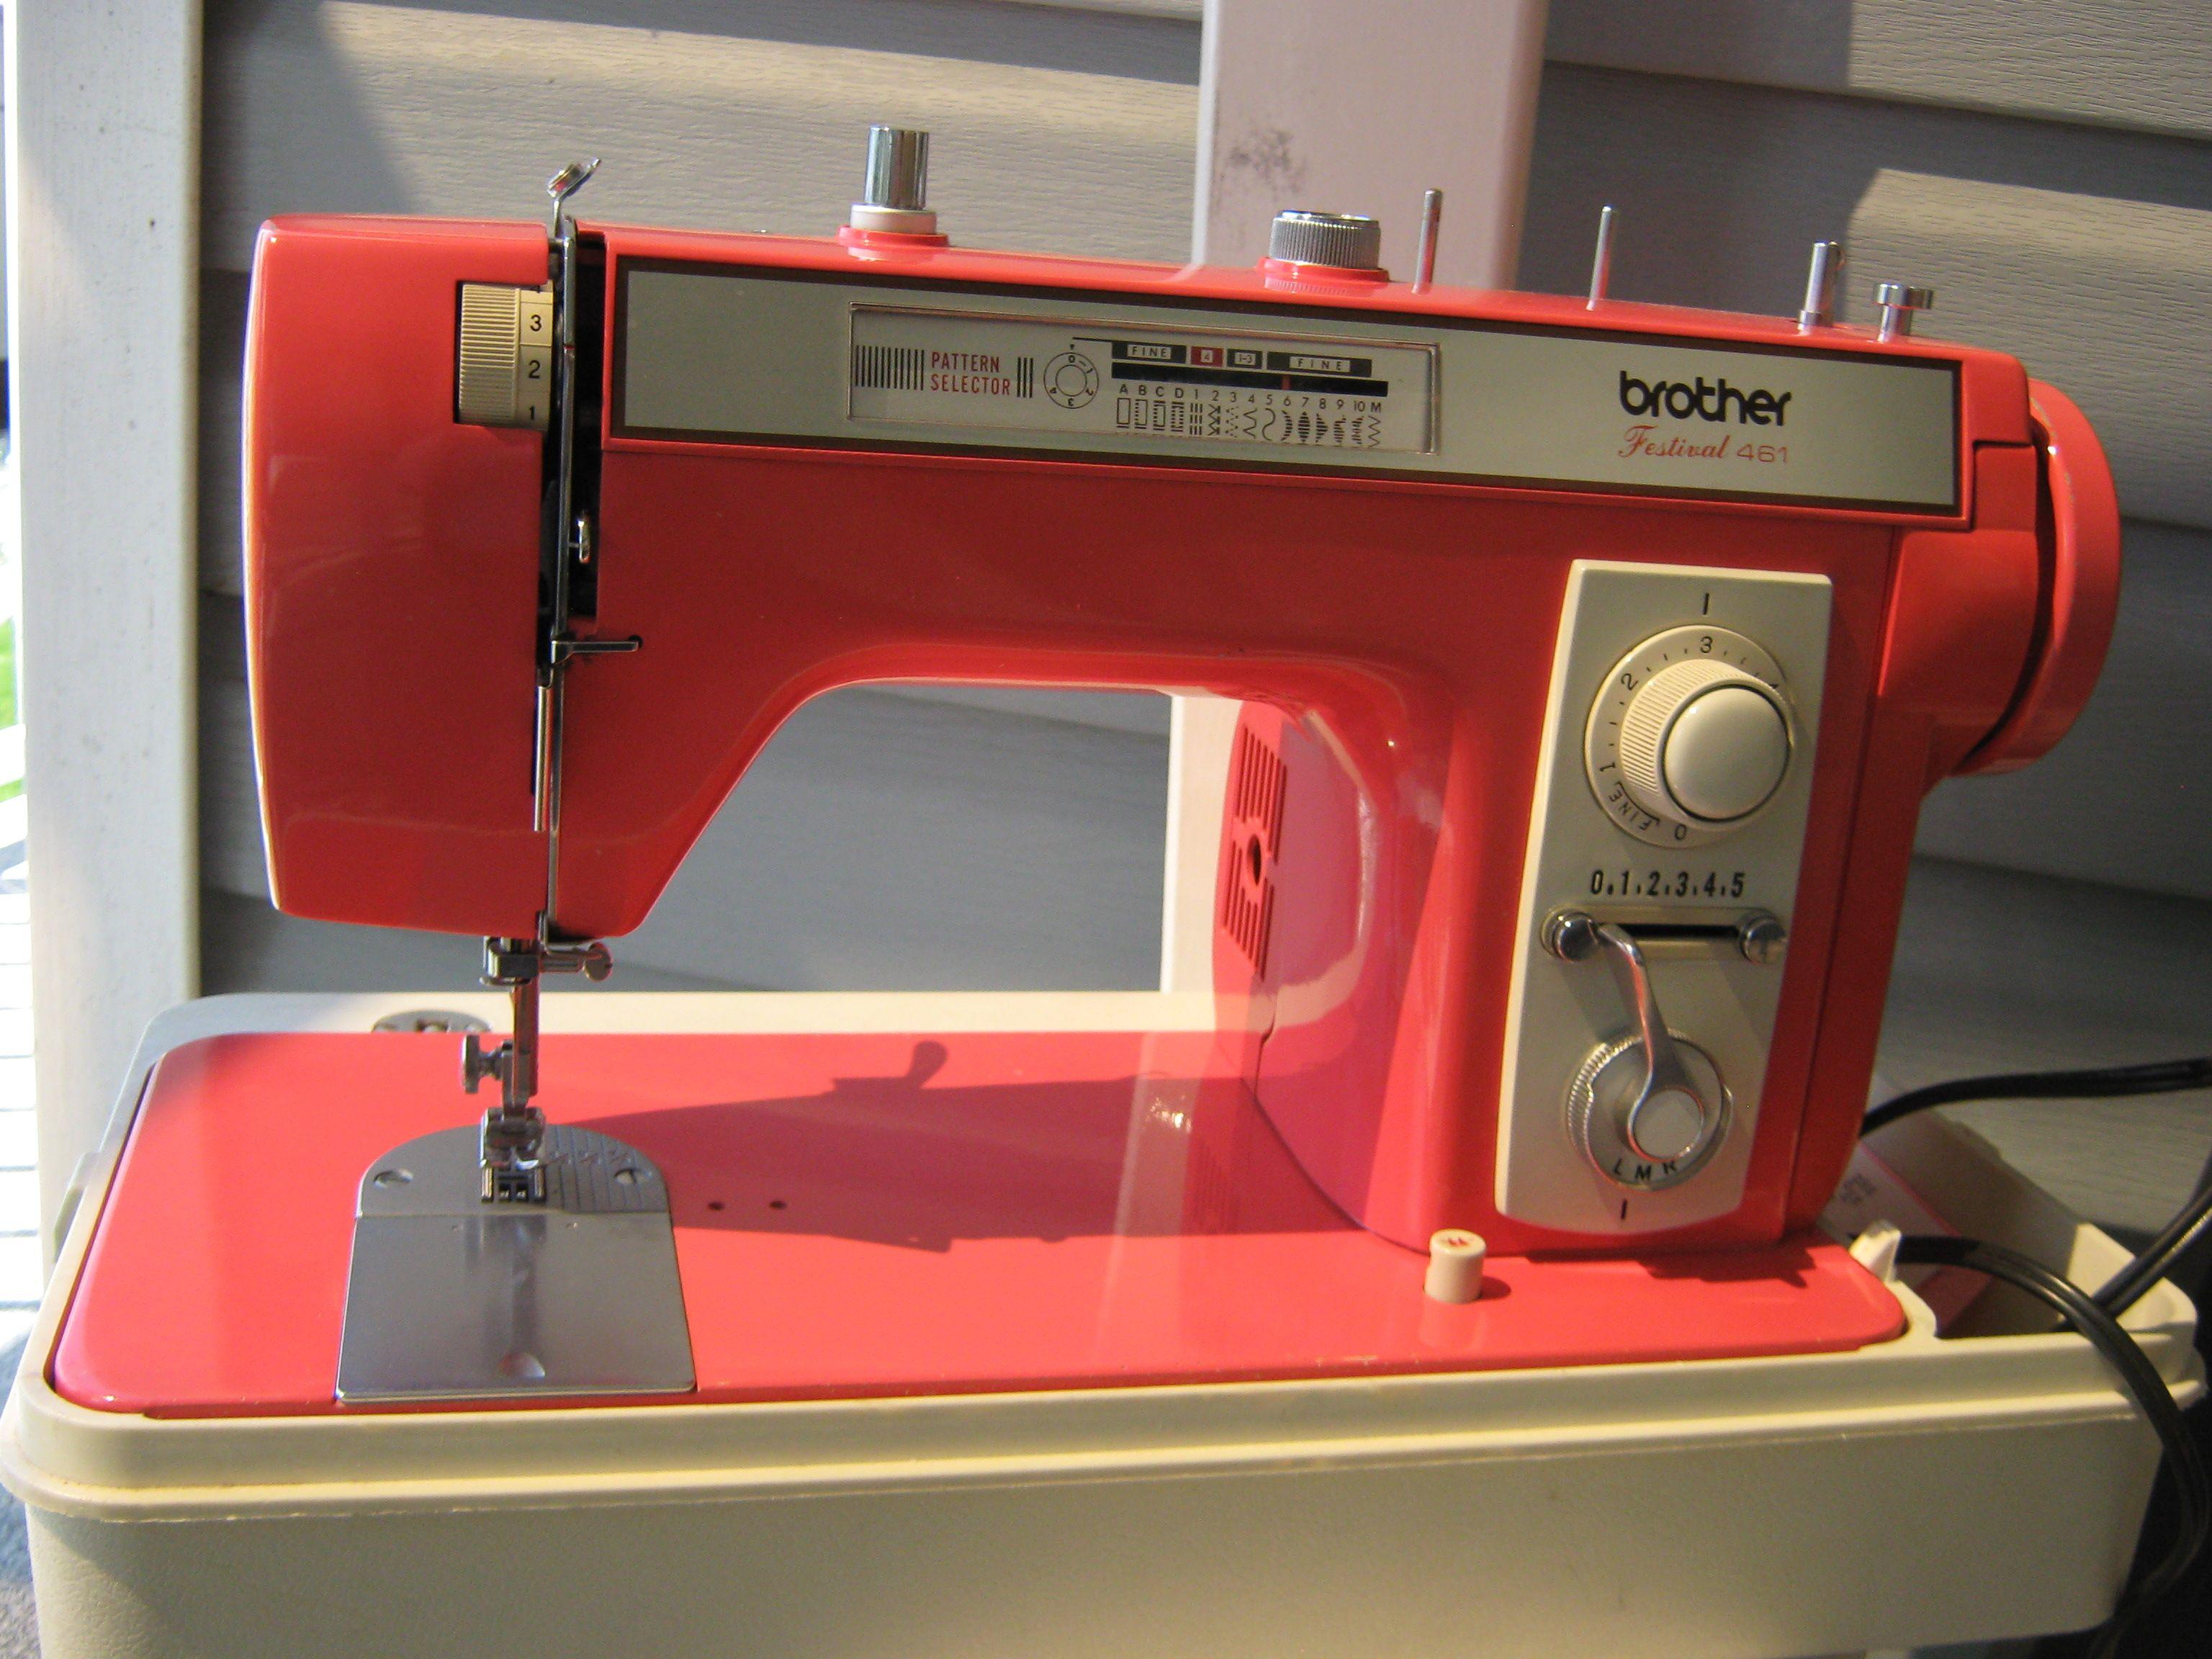 Sewing Machine Vintage Sewing Machines Antique Sewing Machines